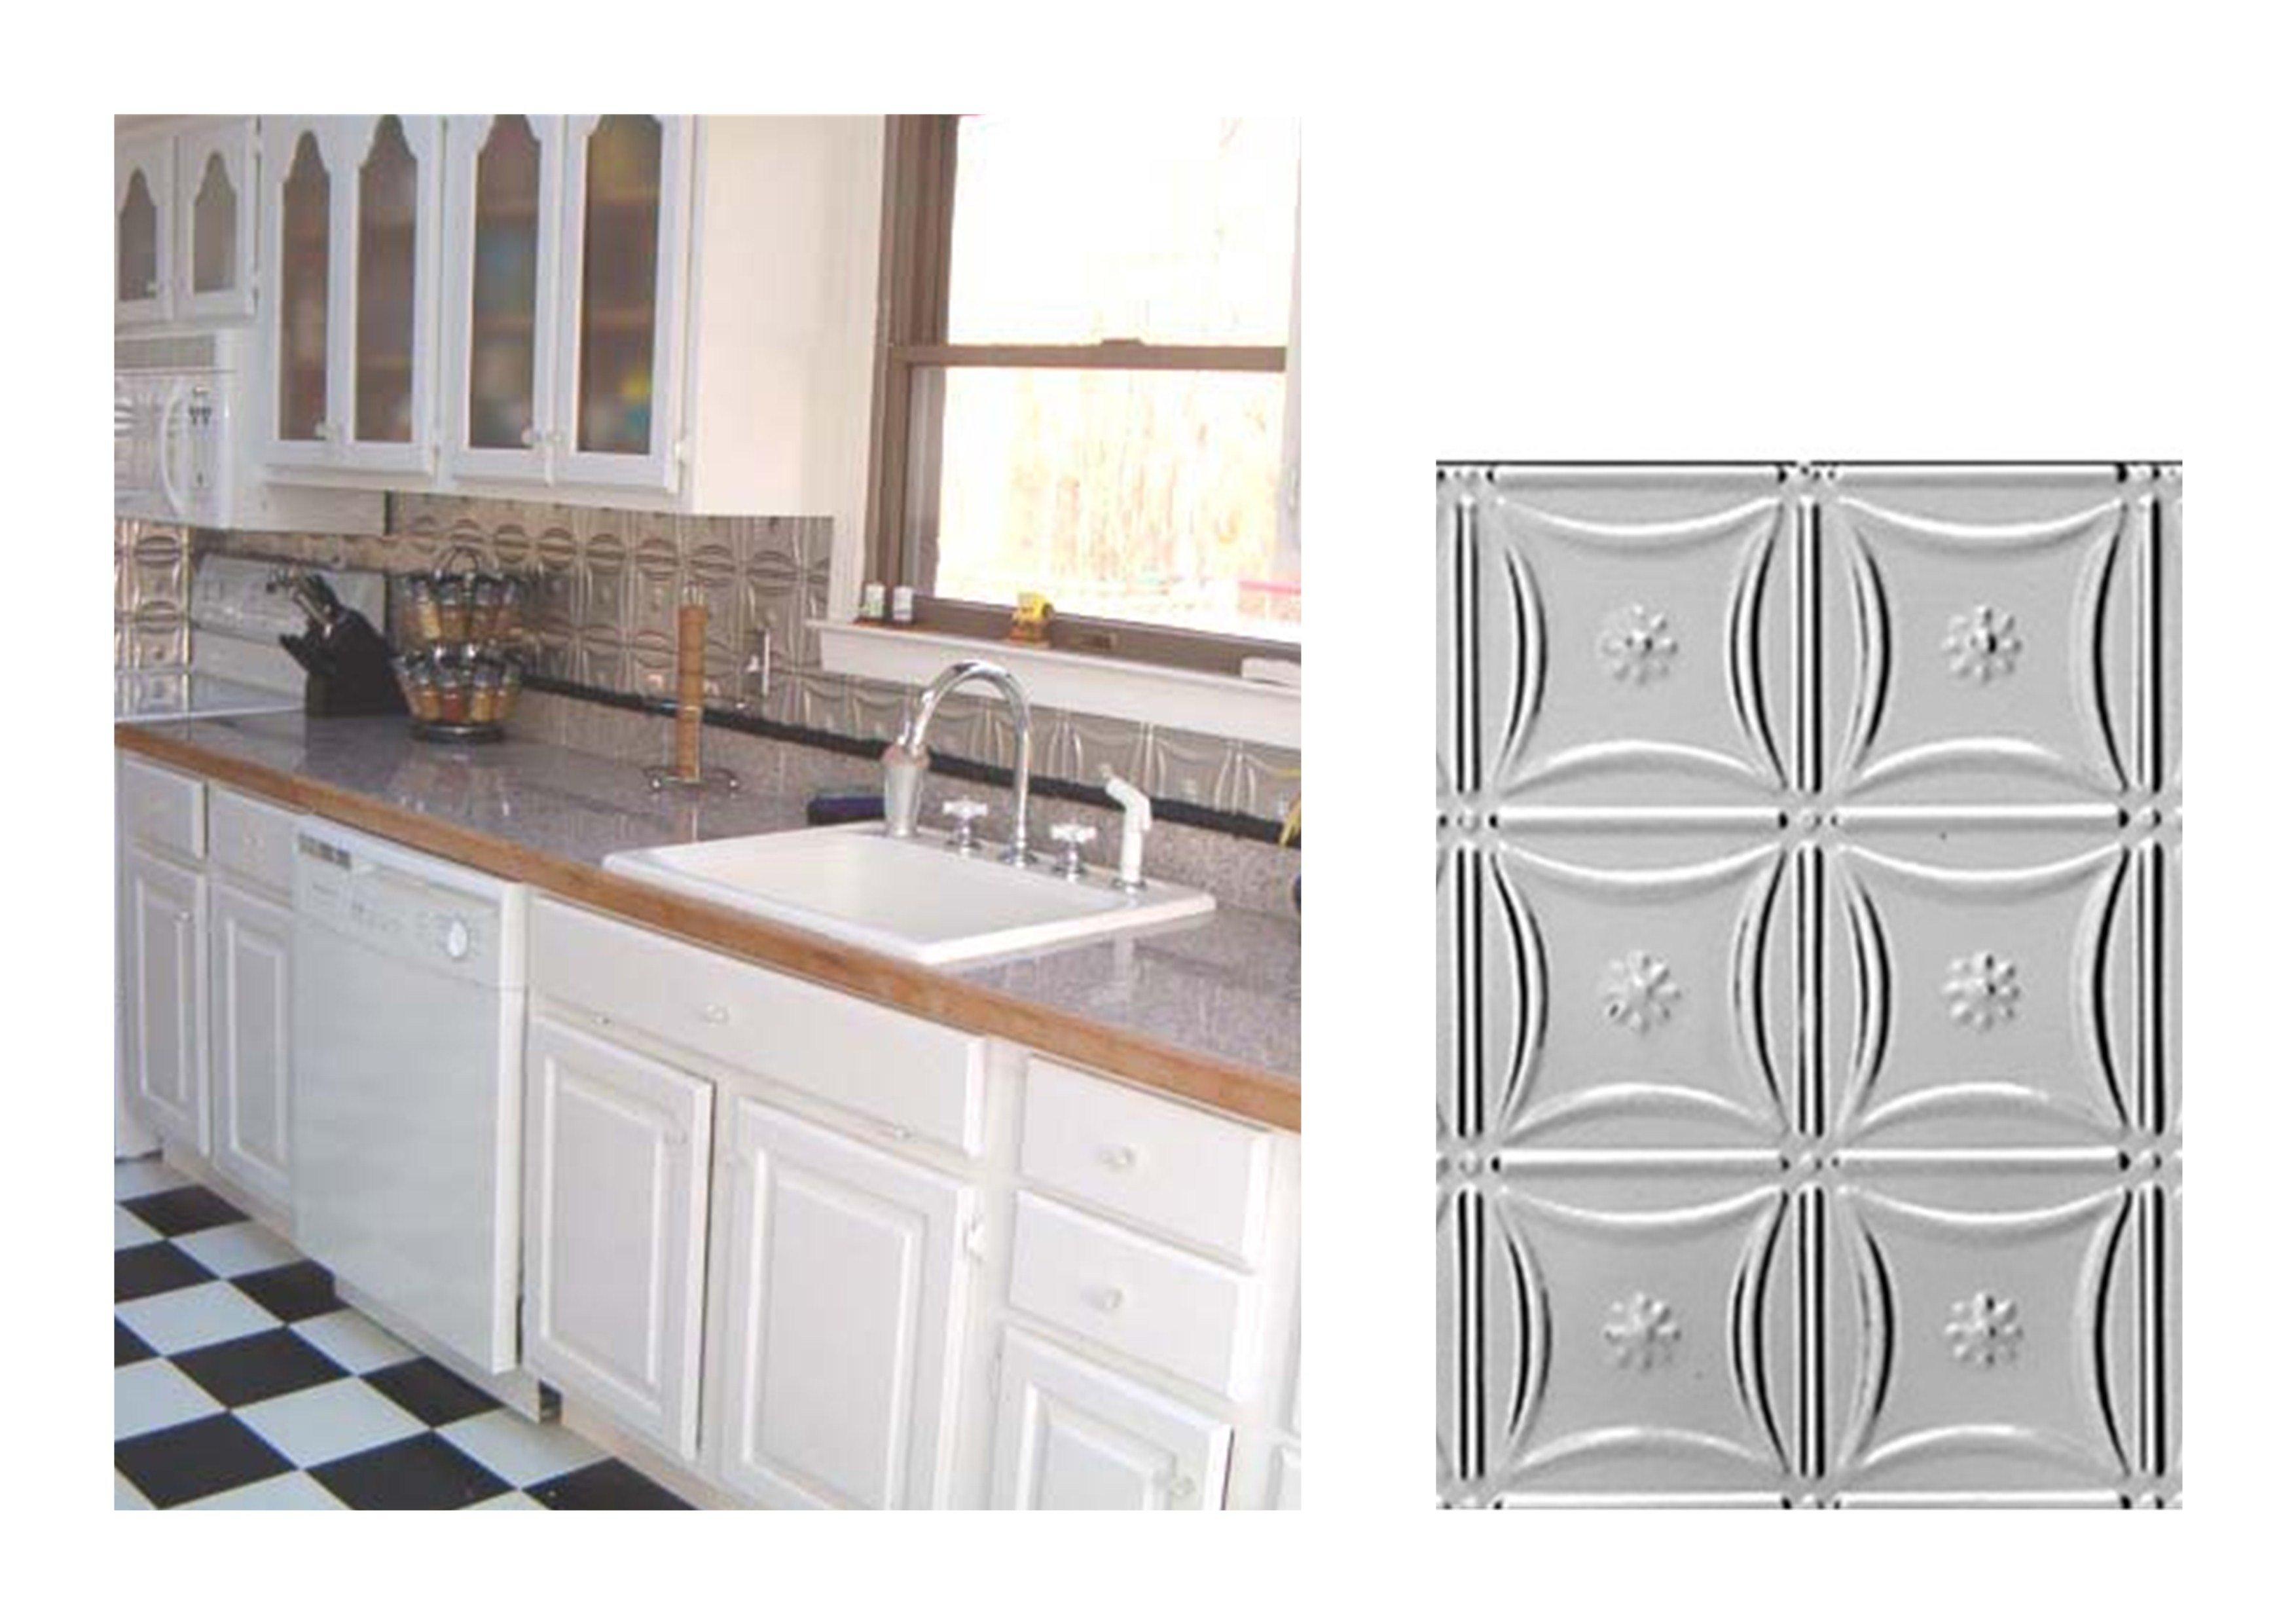 kitchen backsplash ideas decorative tin tiles metal